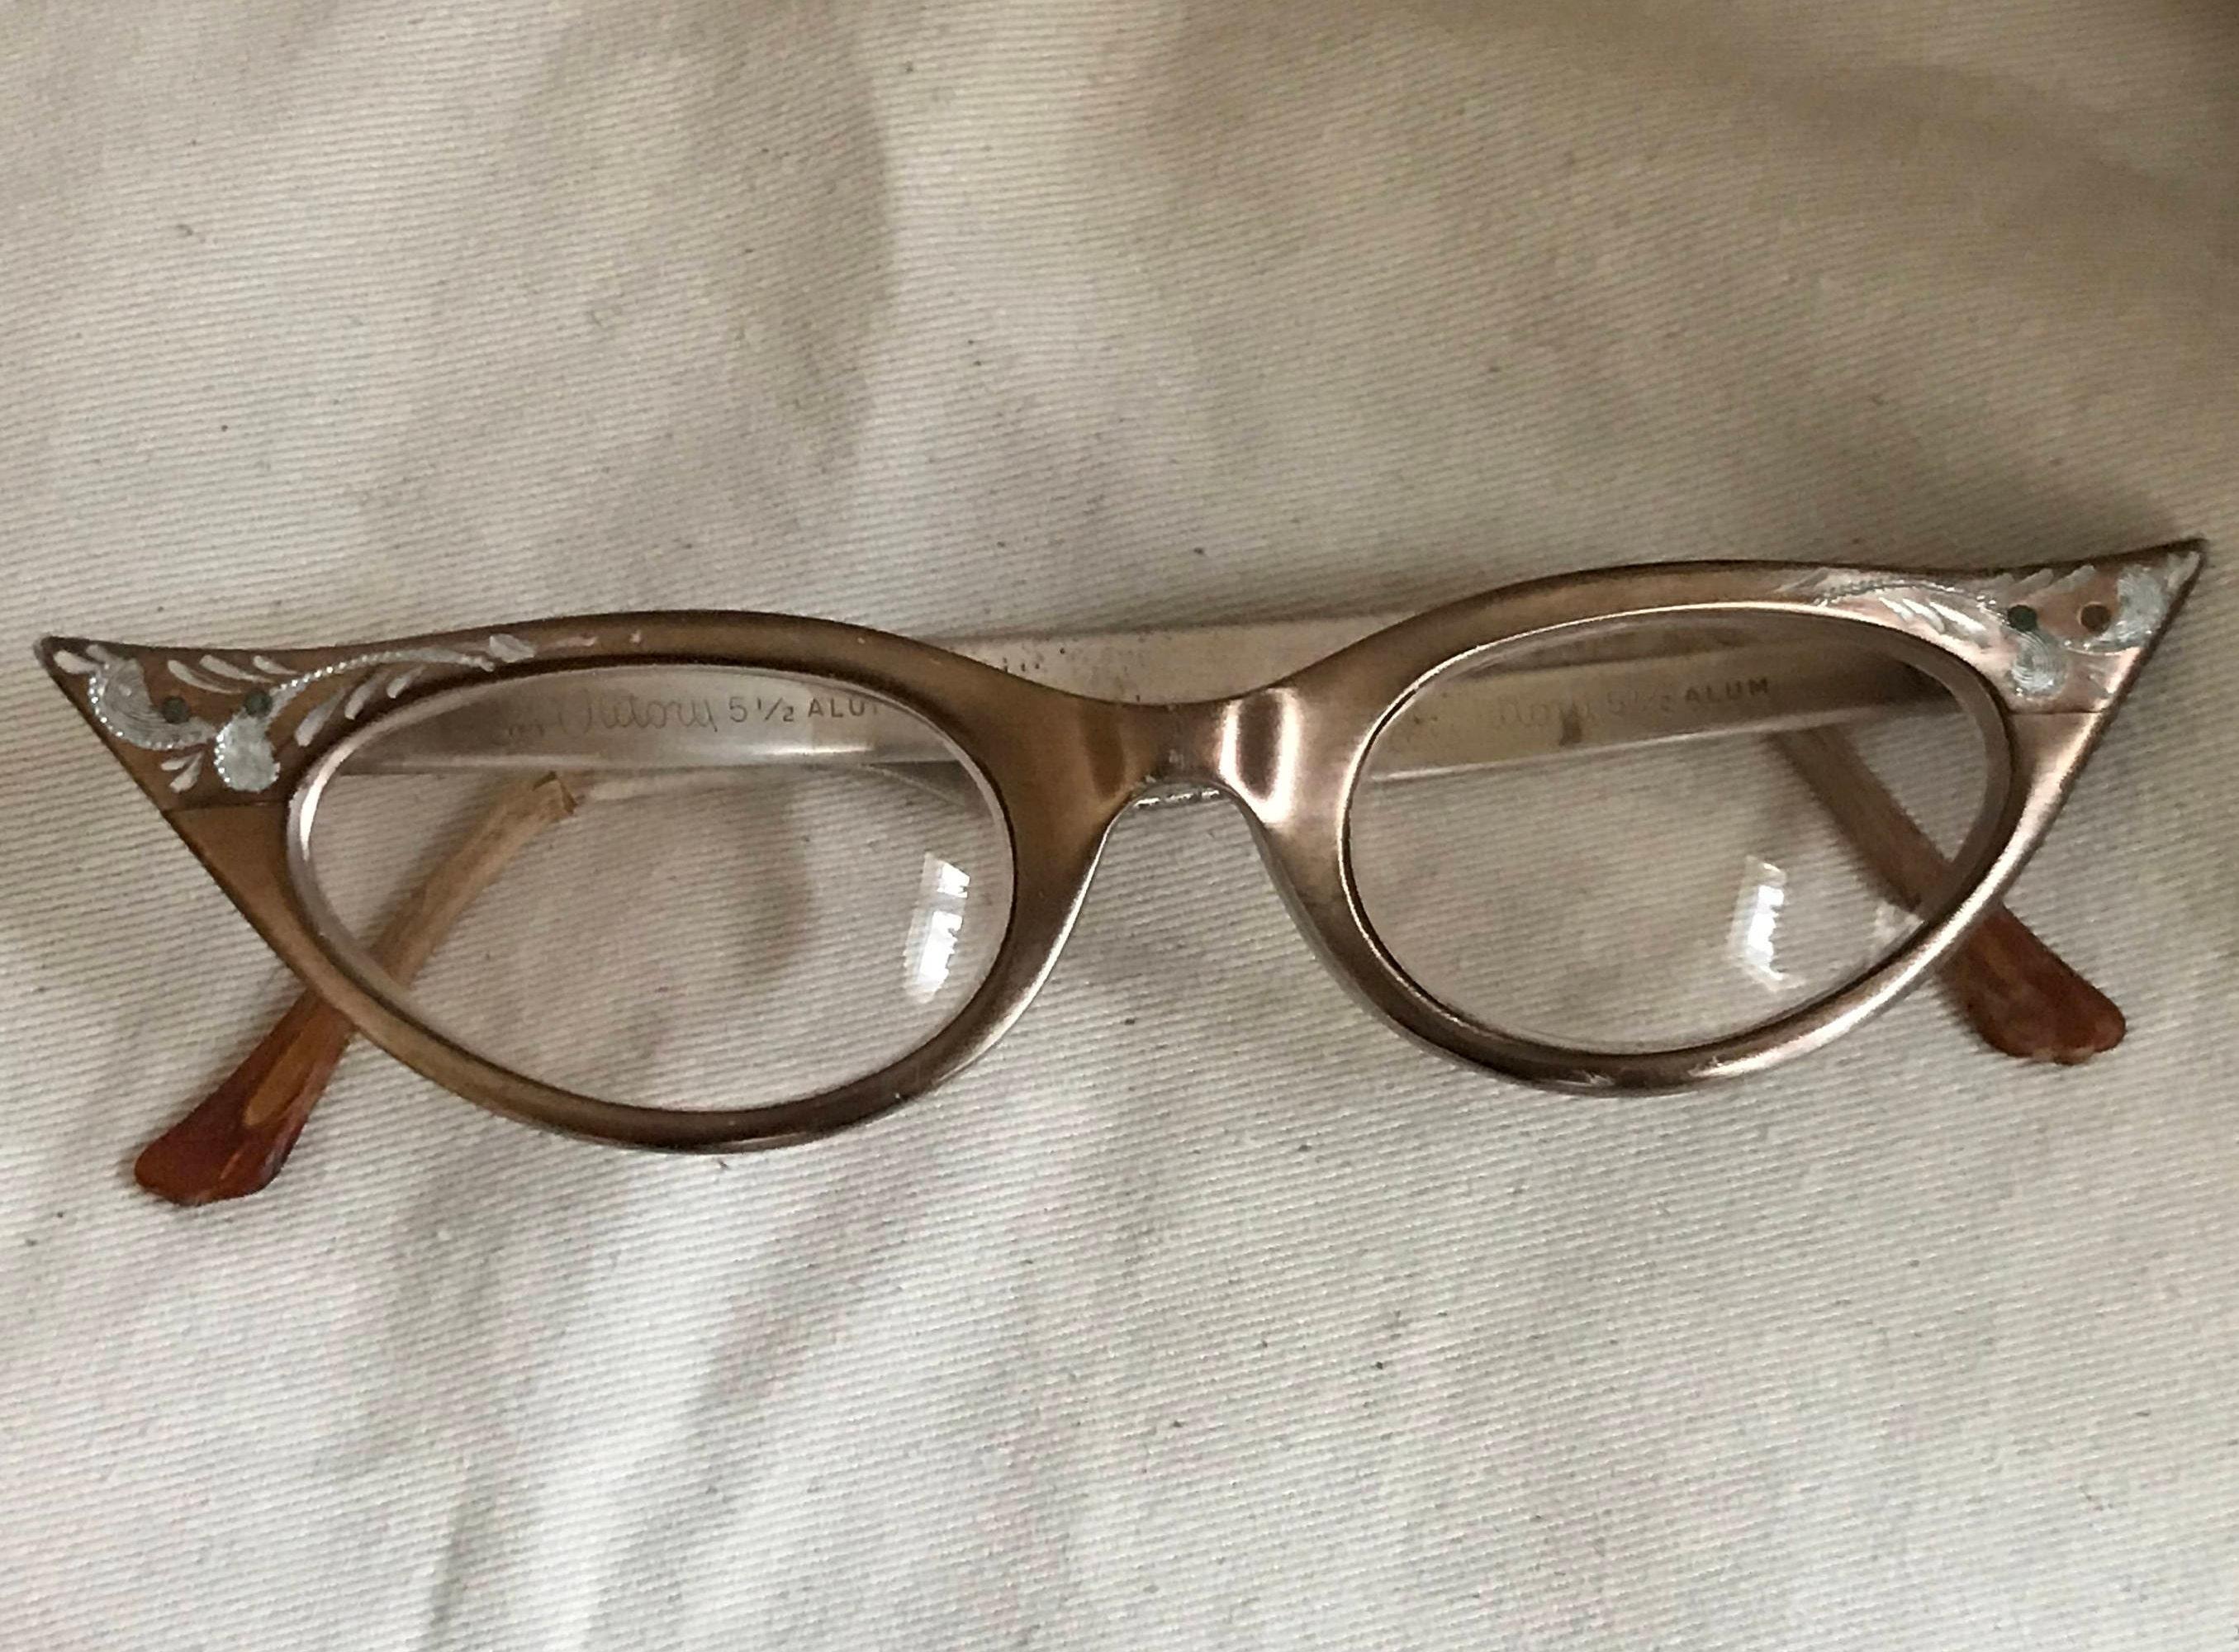 Cats Eye Glasses Etched Aluminum/Victory/1950s 60s/Librarian/Schoolgirl/Hidden Figures/Strangers on a Train/Vintage Eyeglasses